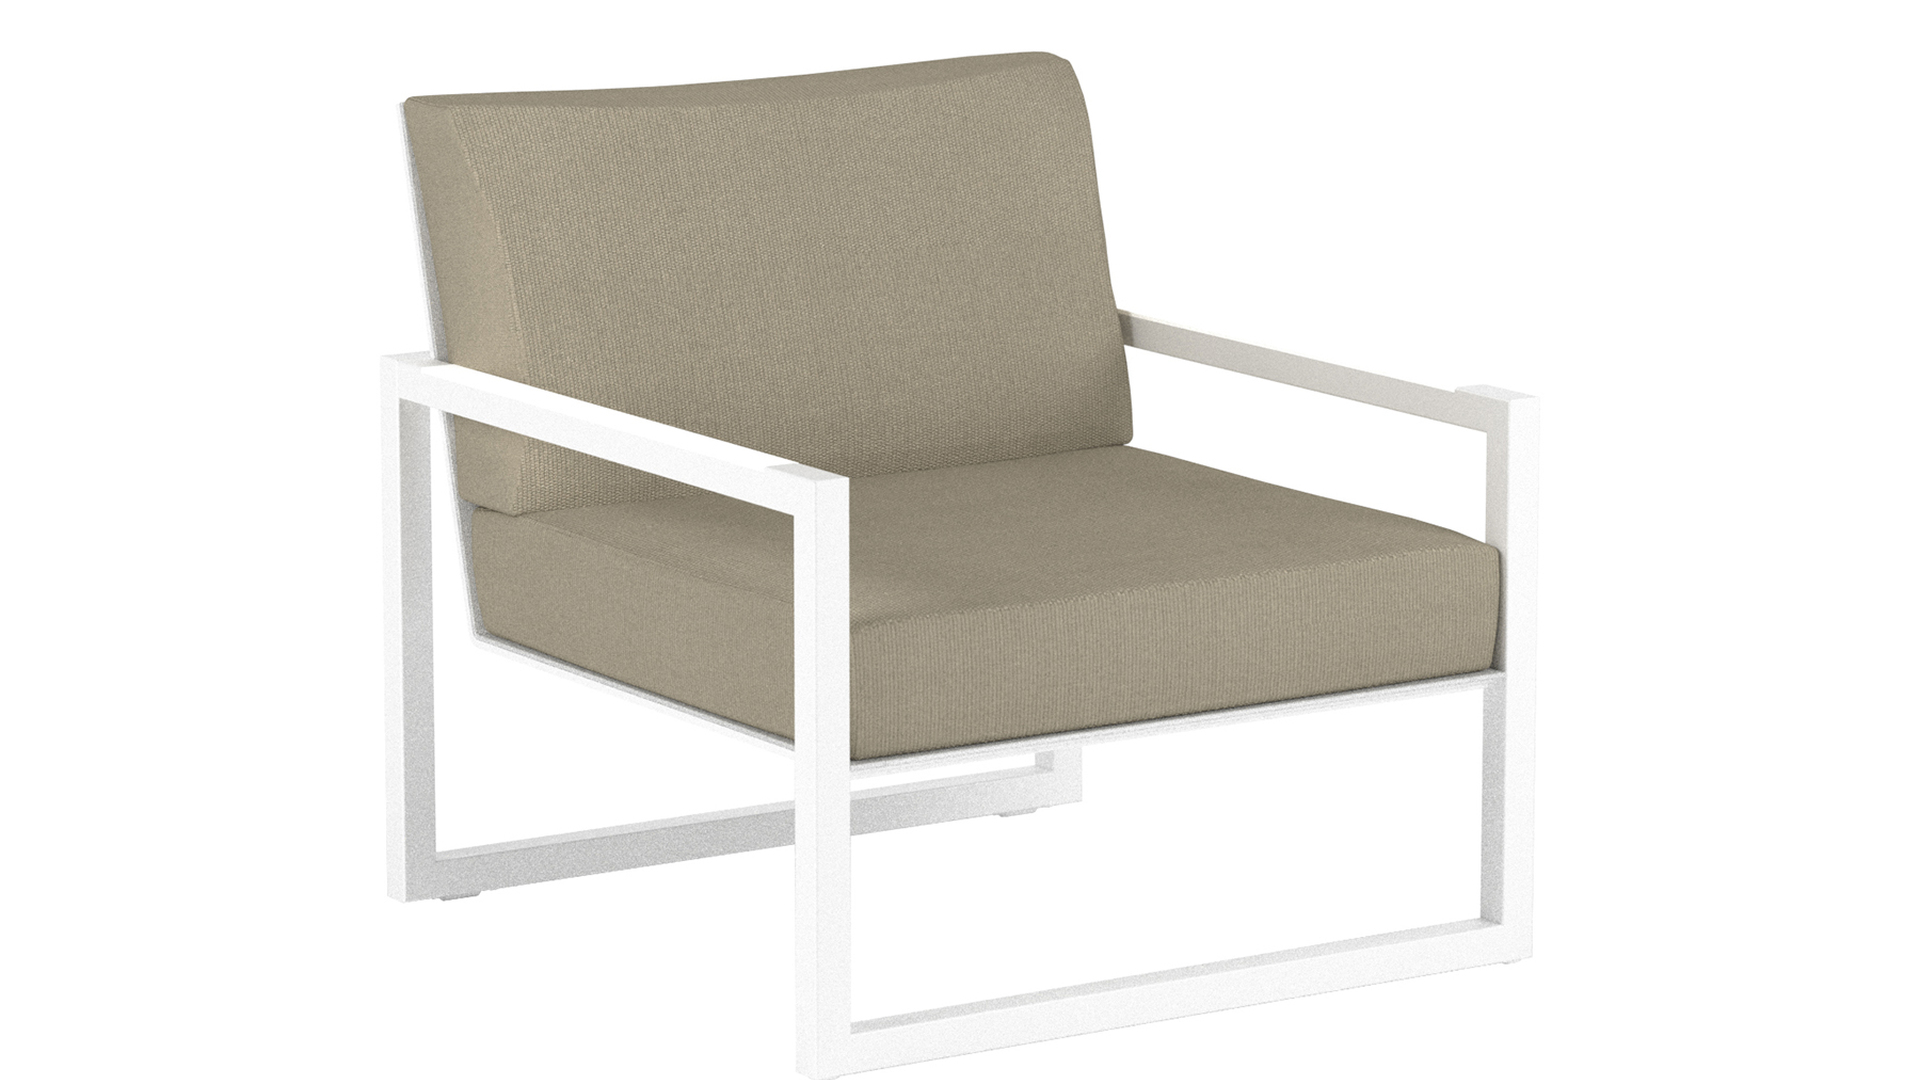 Ninix lounge one seater white.jpg